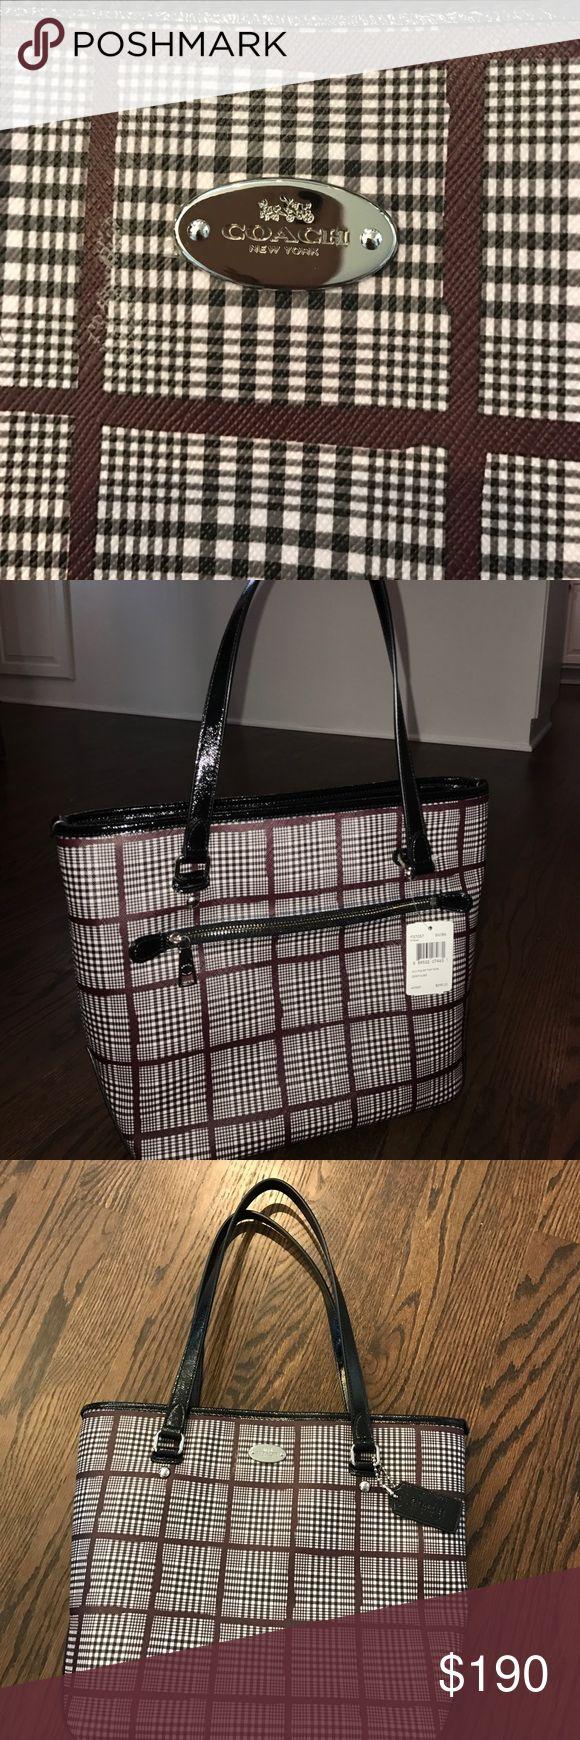 "Plaid Coach shoulder bag! New with tags!! Maroon, black and white plaid shoulder bag. Brand new with tags. Bag dimensions w/o straps - 10""h x 13""w. Bag dimensions with straps- 19""h x 13""w. Interior has two open pockets and one zip pocket. Coach Bags Shoulder Bags"